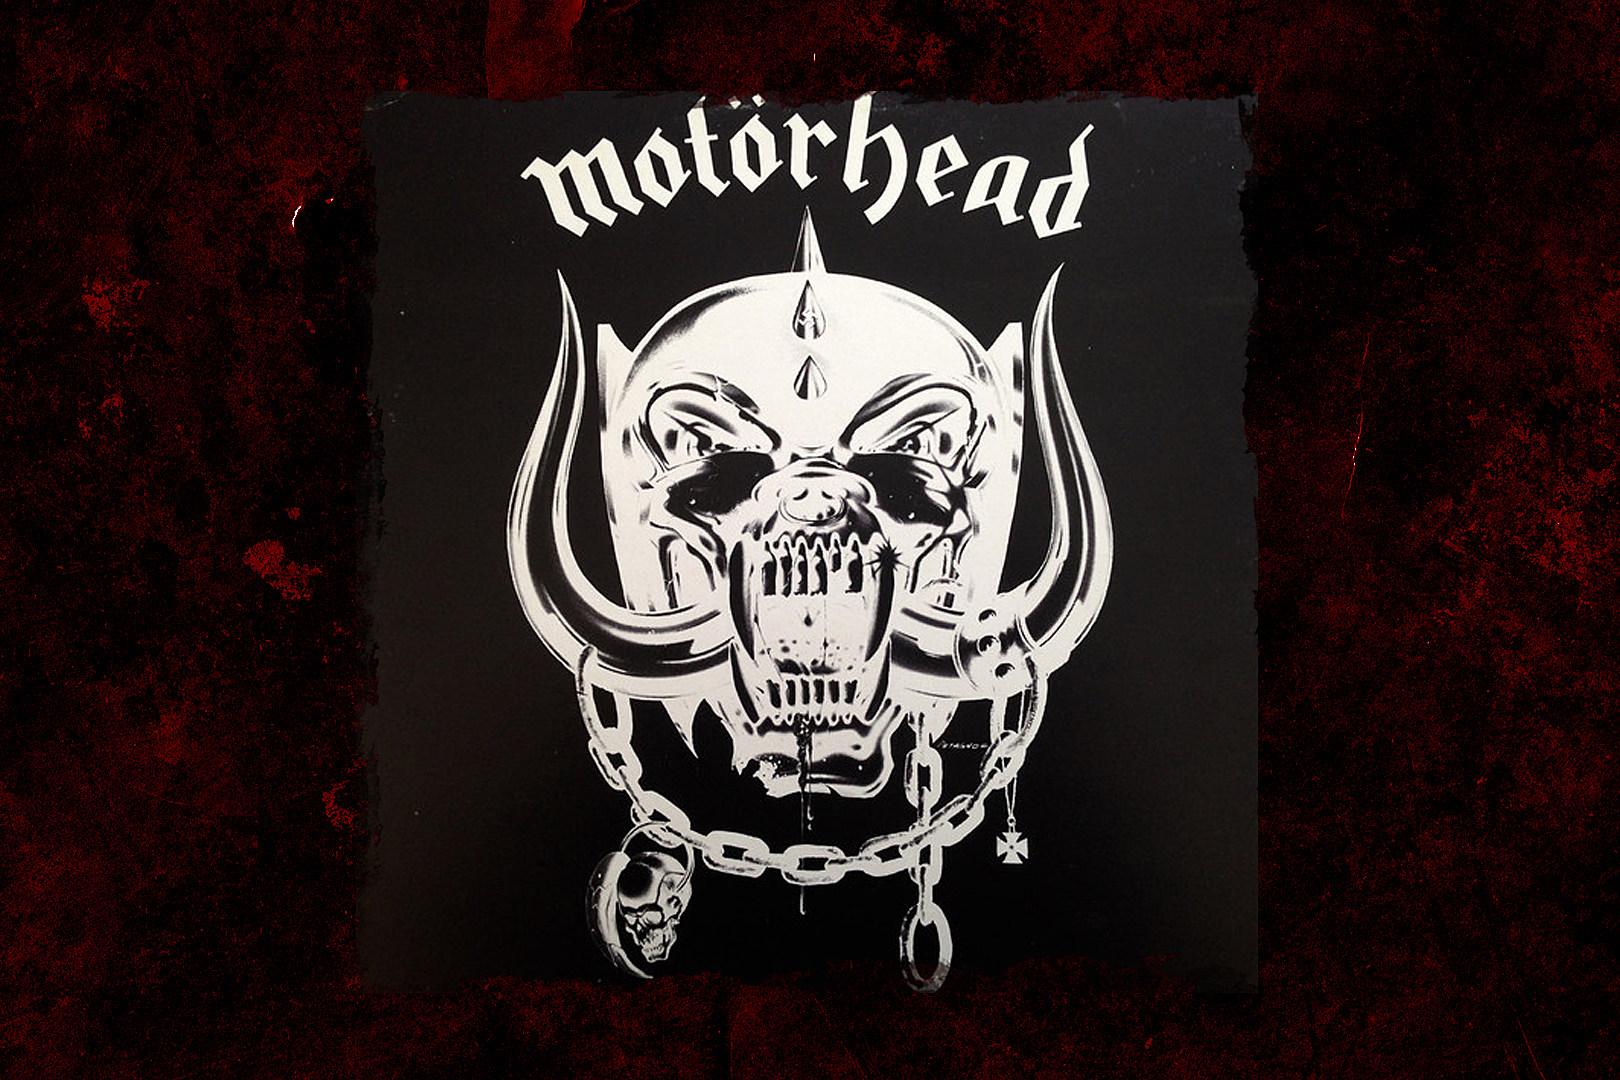 40 Years Ago: Motorhead Release Second Album 'Overkill'